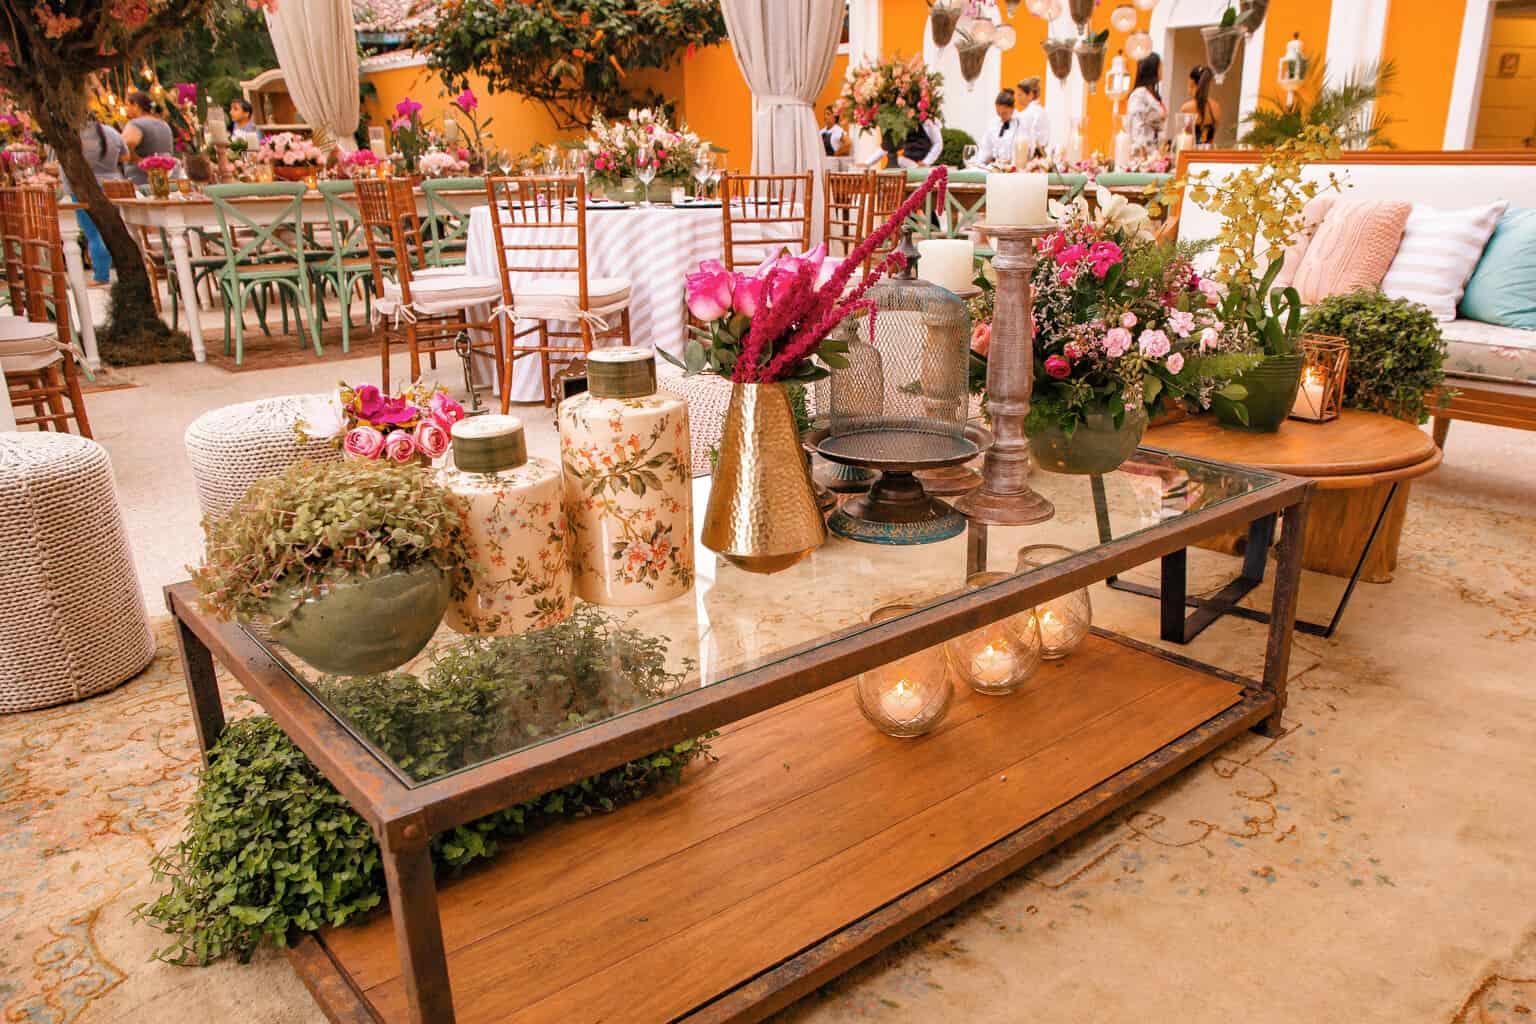 casamento-Beatriz-e-Joao-Fernando-decoracao-colorida-Itaipava-Locanda-Della-Mimosa-Thienny-Tammis85